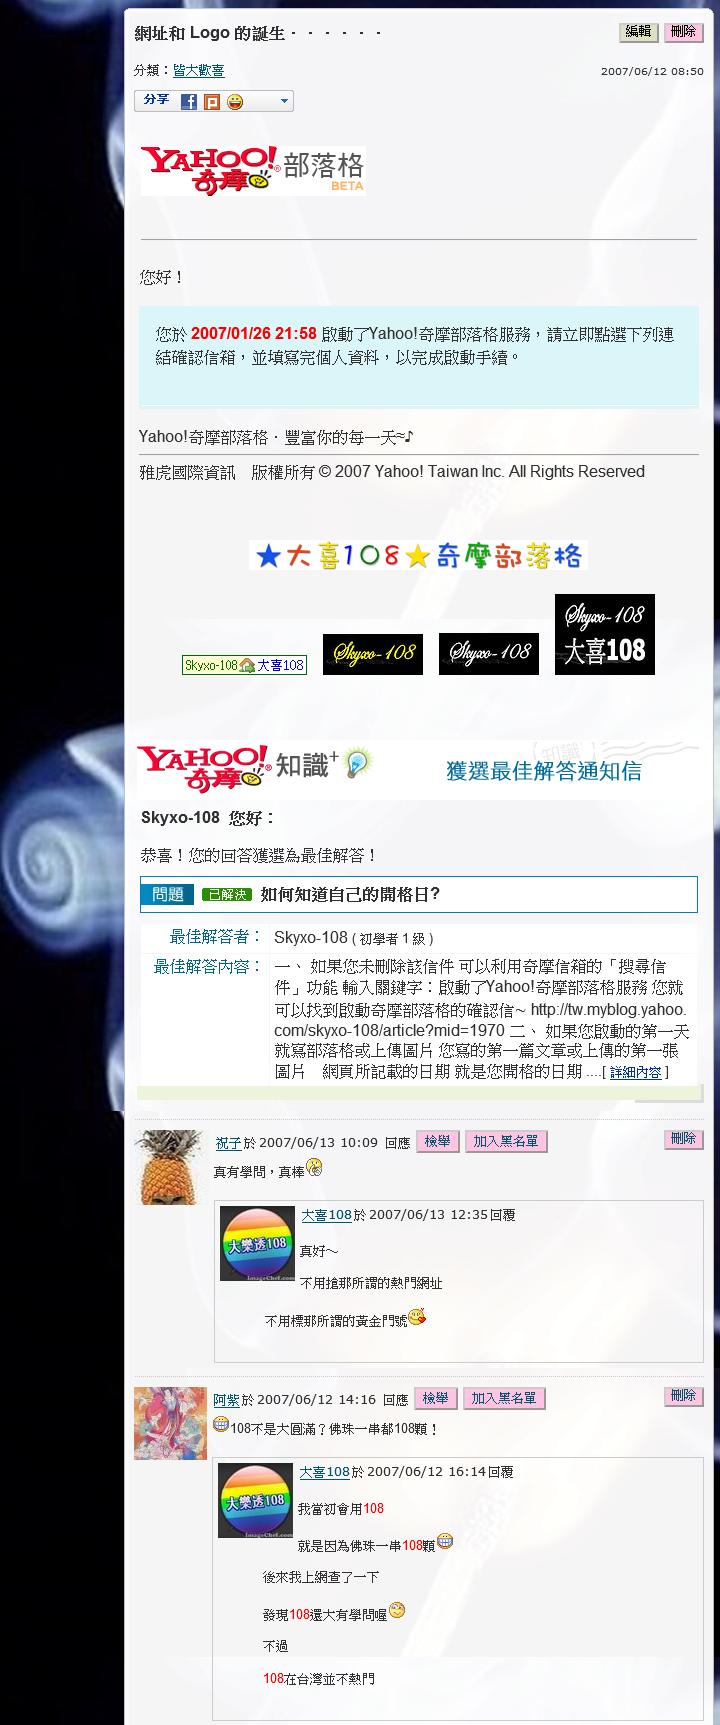 Skyxo-108 ★大喜108★/網址和 Logo 的誕生/108不是大圓滿?佛珠一串都108顆!/格友「阿紫」的回應